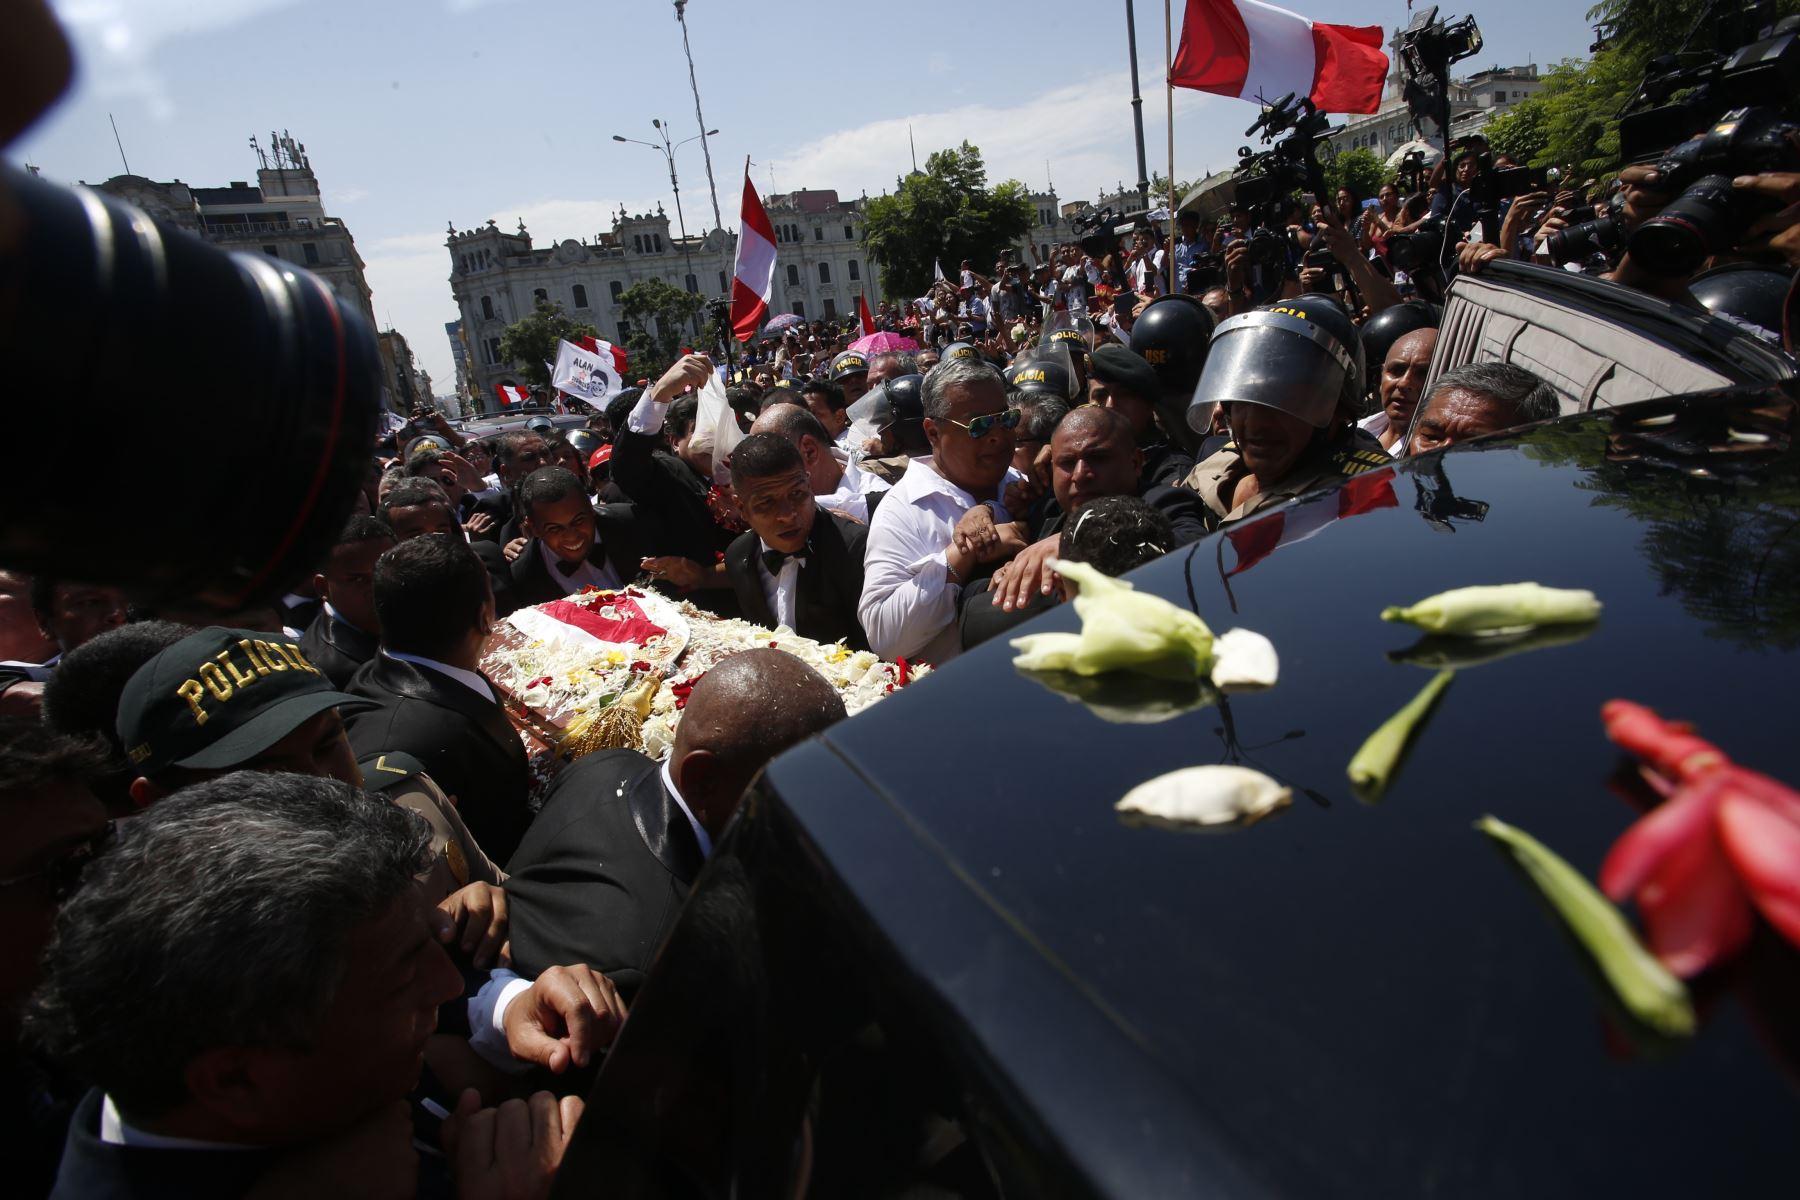 Restos del expresidente Alan García son trasladados al cementerio de Huachipa.  Foto: ANDINA: Nathalie Sayago.